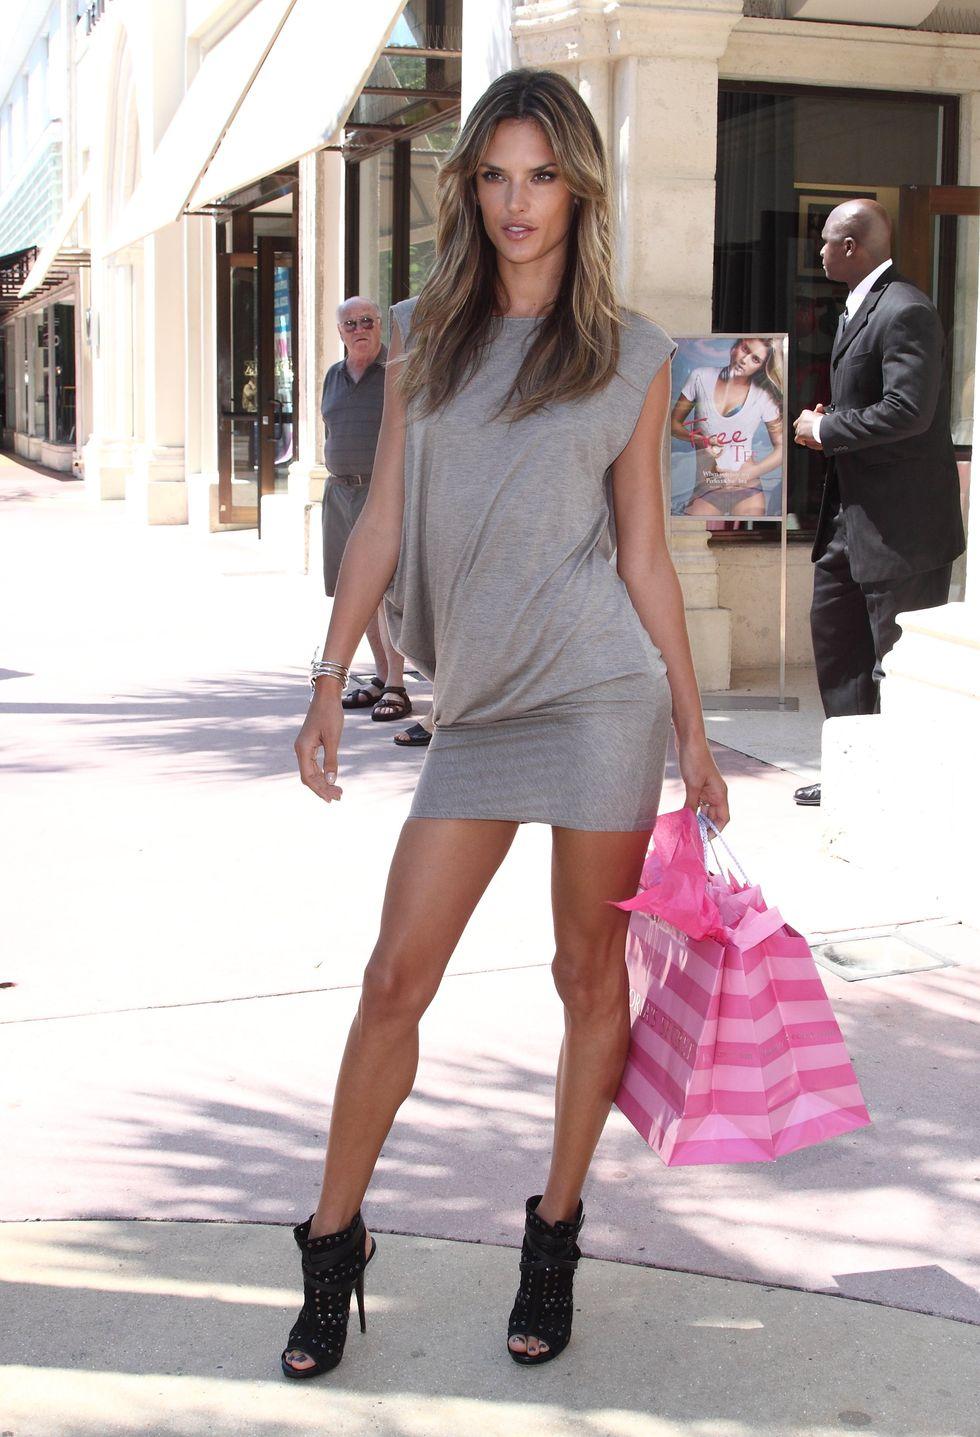 alessandra-ambrosio-leggy-in-short-dress-at-victorias-secret-store-01